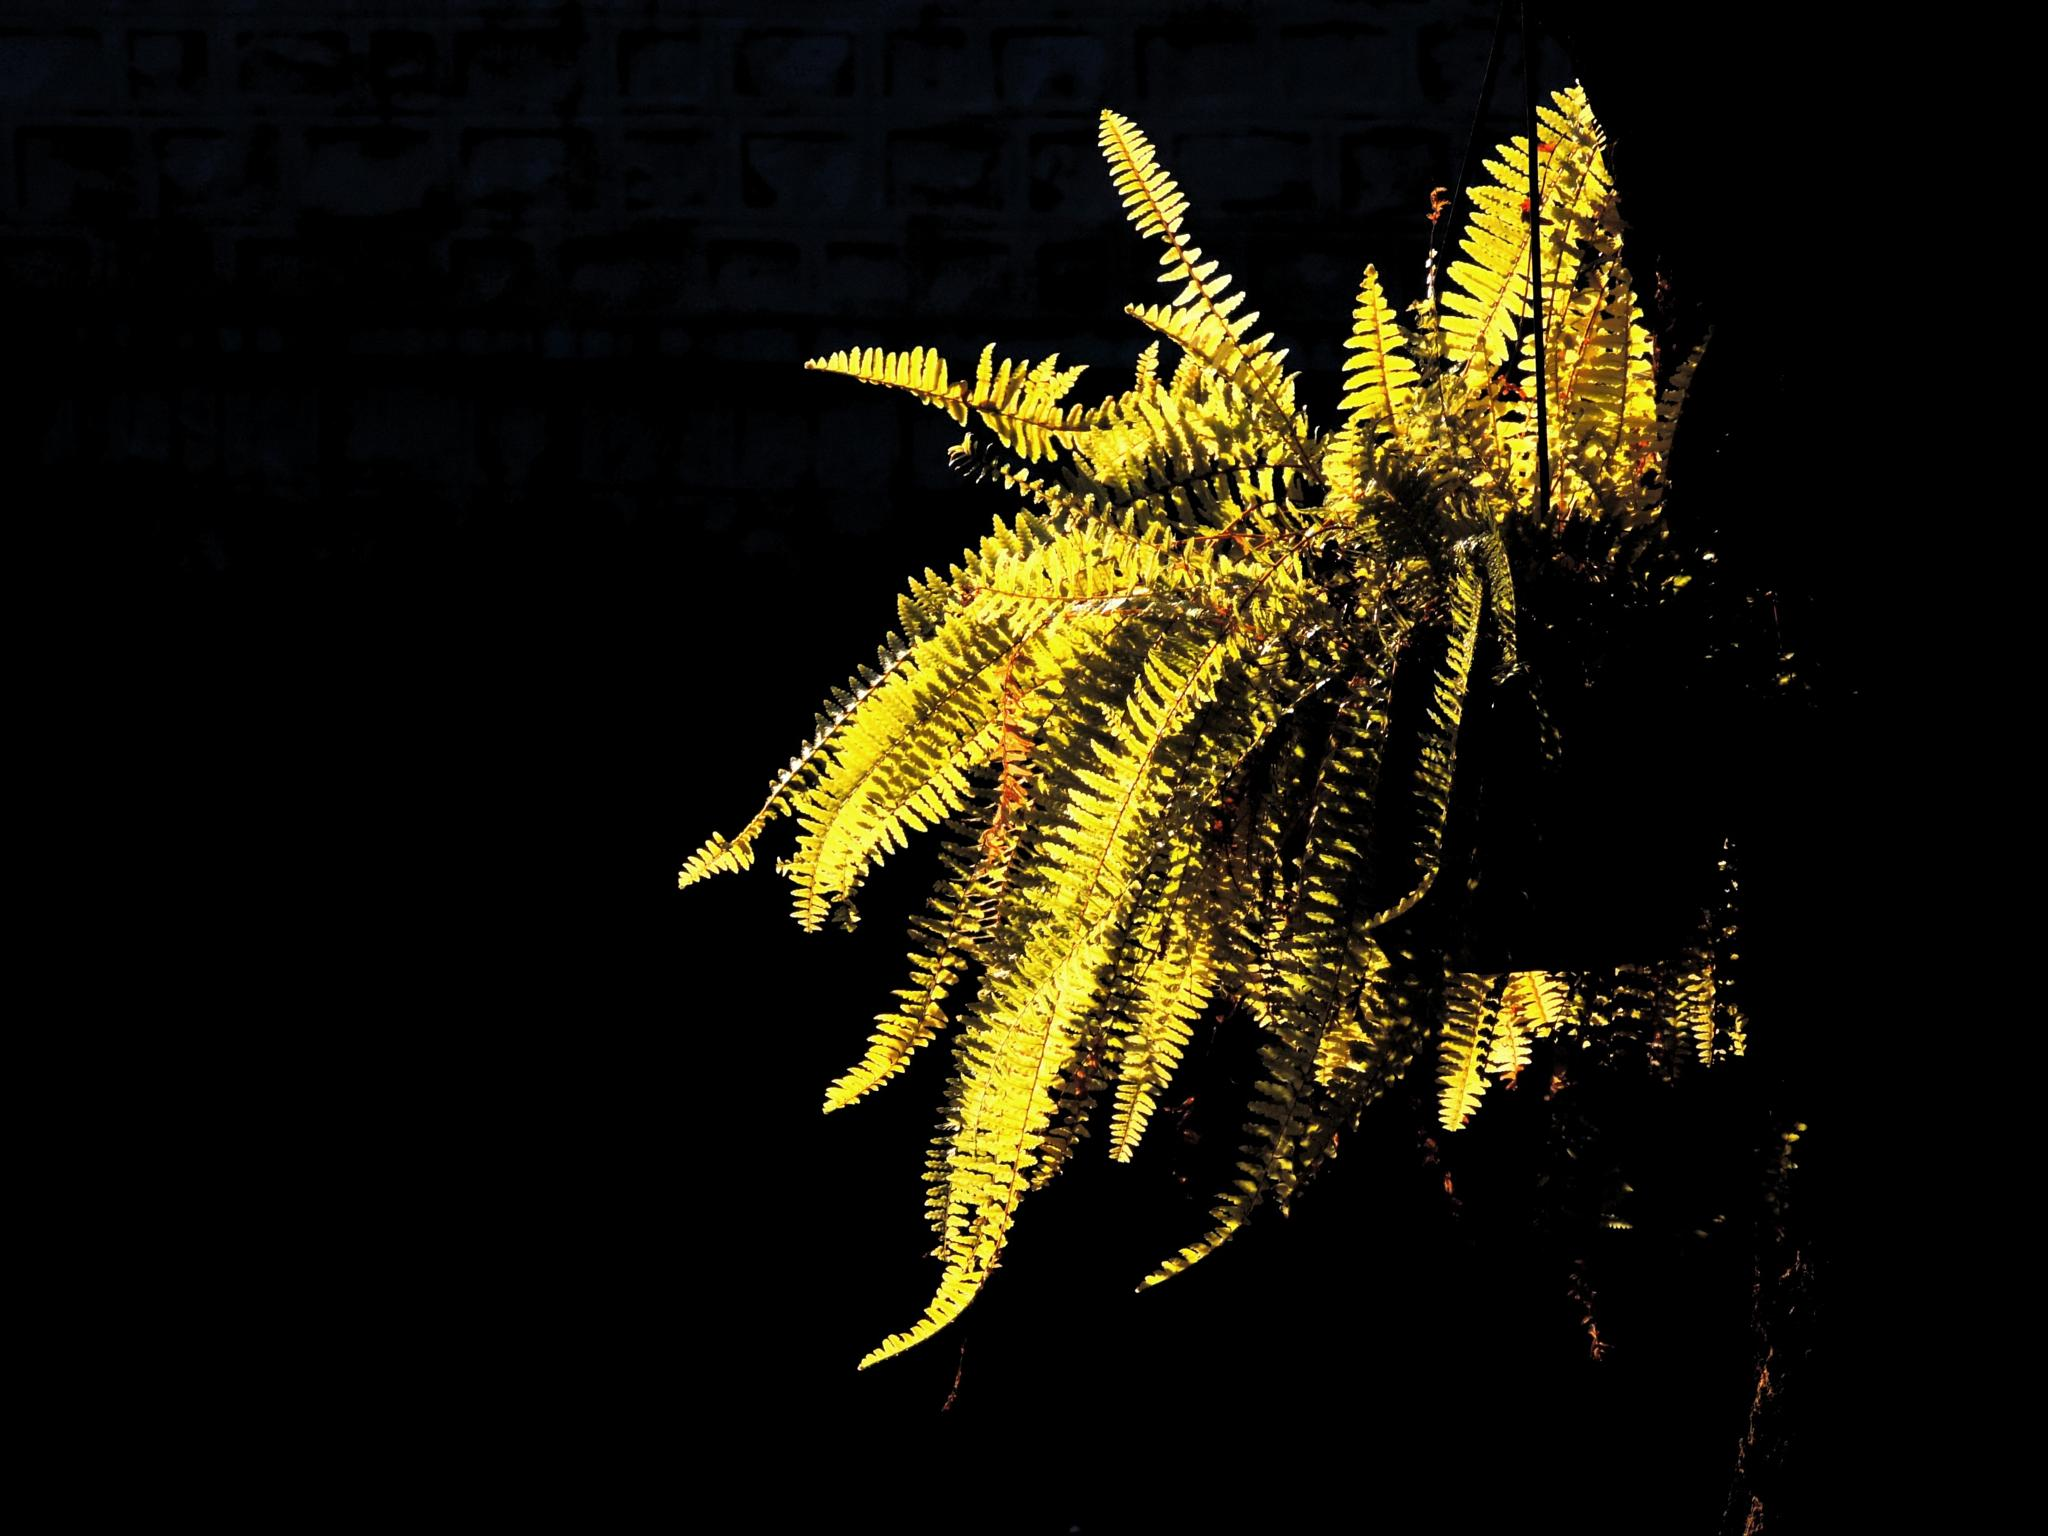 a sun soaked fern by sunishchalananda